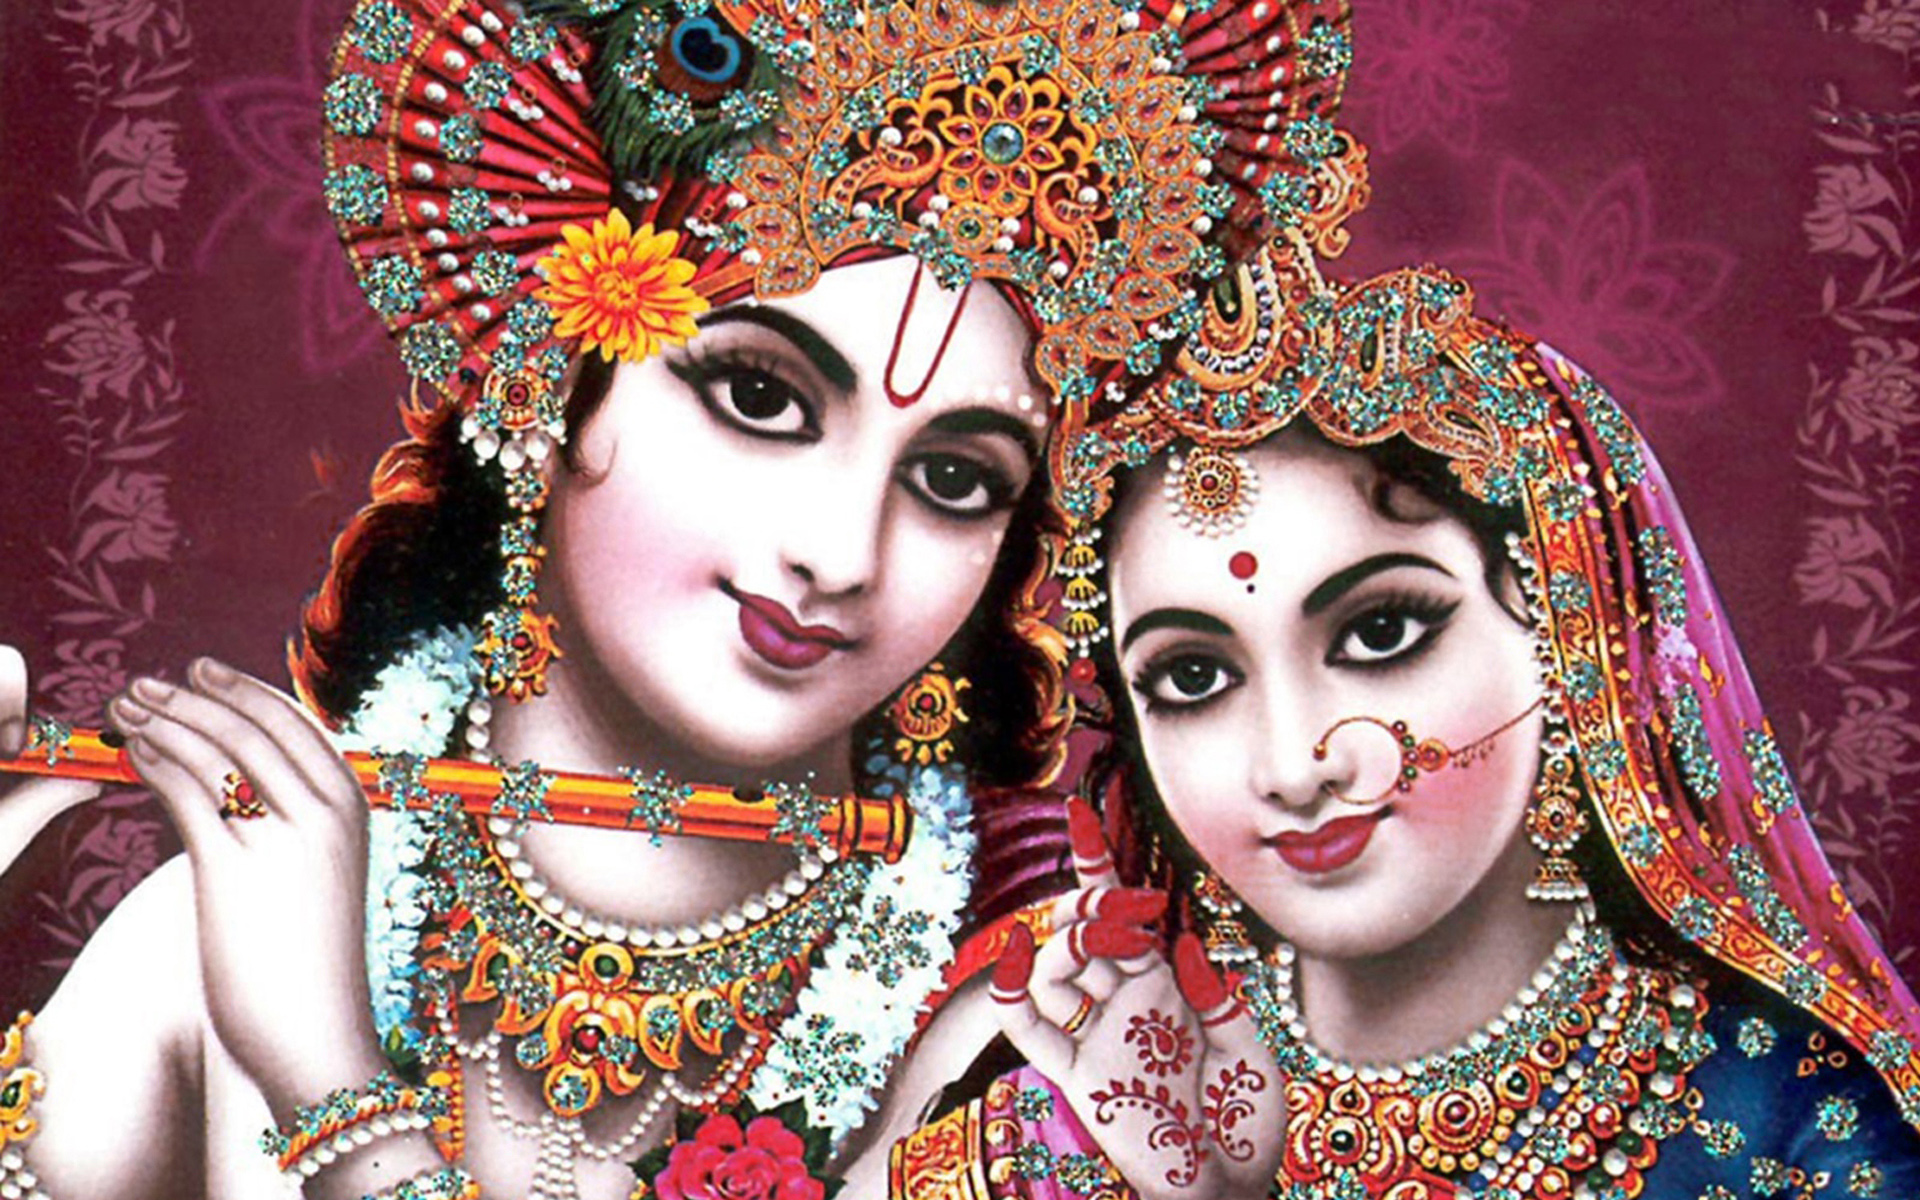 Indian God Radha Krishna Wallpapers HD Wallpapers 1920x1200